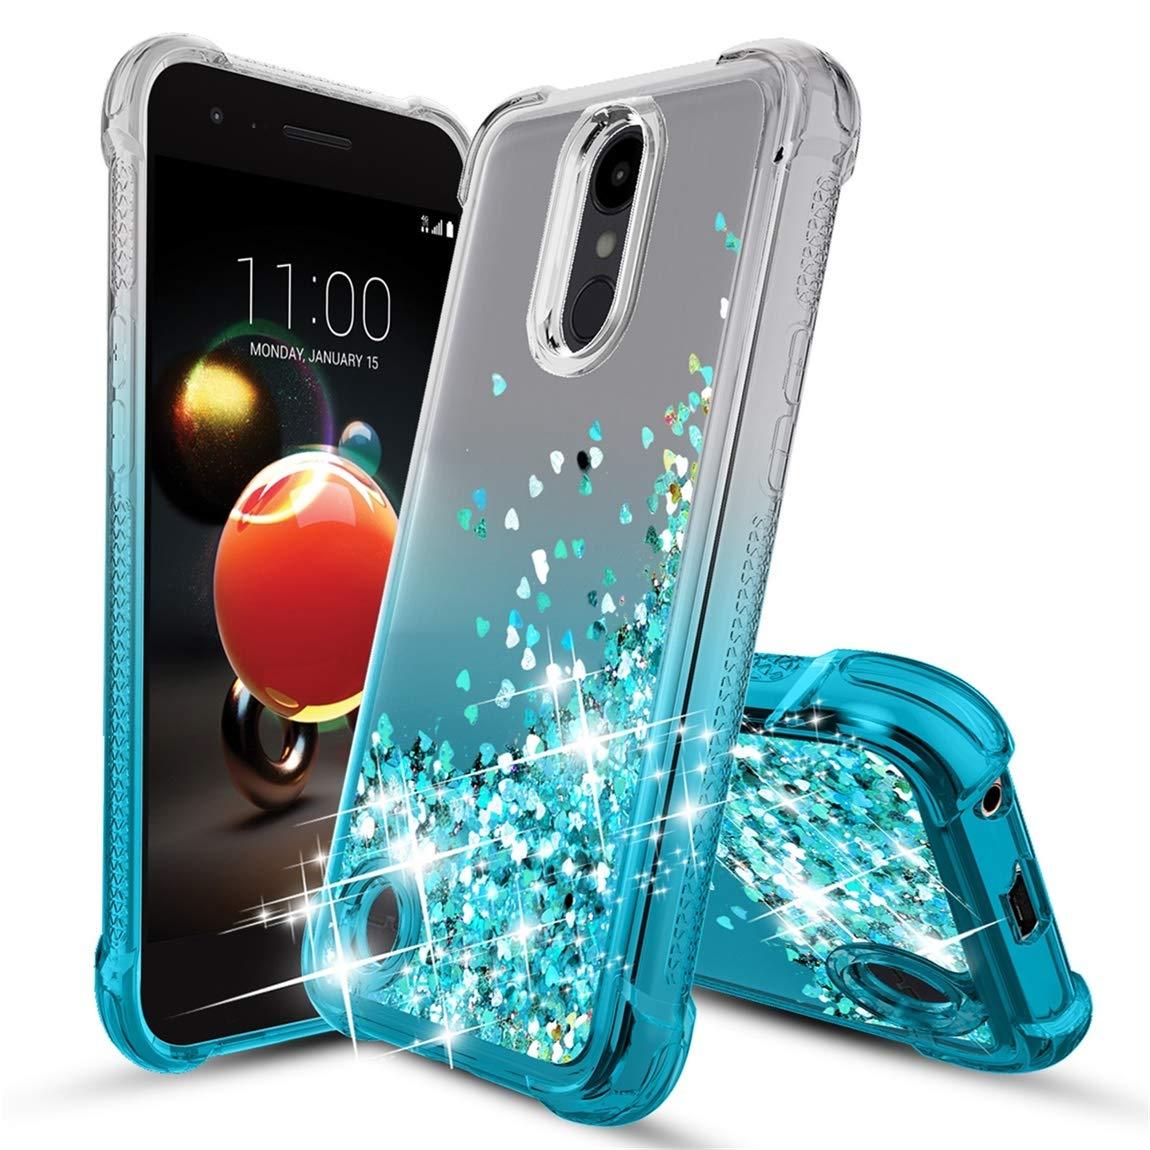 LG Aristo 2 Case,LG Aristo 3/Rebel 4 LTE/Tribute Empire/Dynasty/Fortune 2/Phoenix 4/ Aristo 2 Plus/Zone 4/Risio 3/K8+/LG K8S Phone Case,Glitter Quicksand Protective Phone Cover for Girls Women-Teal